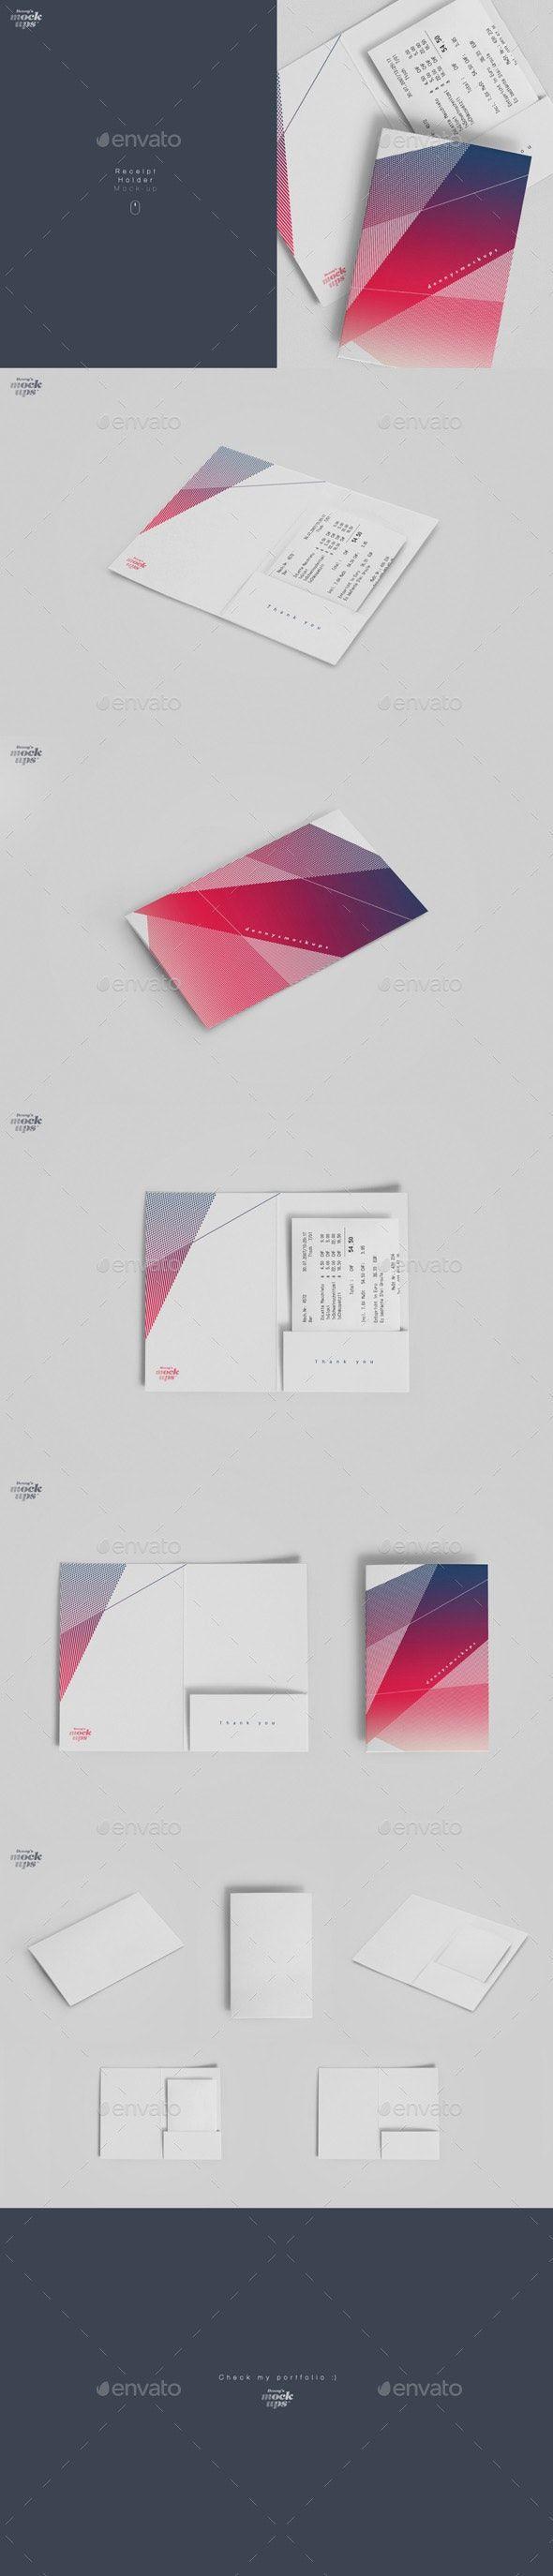 Receipt Holder Mockup Creative Graphic Design Graphic Design Templates Mockup Photoshop